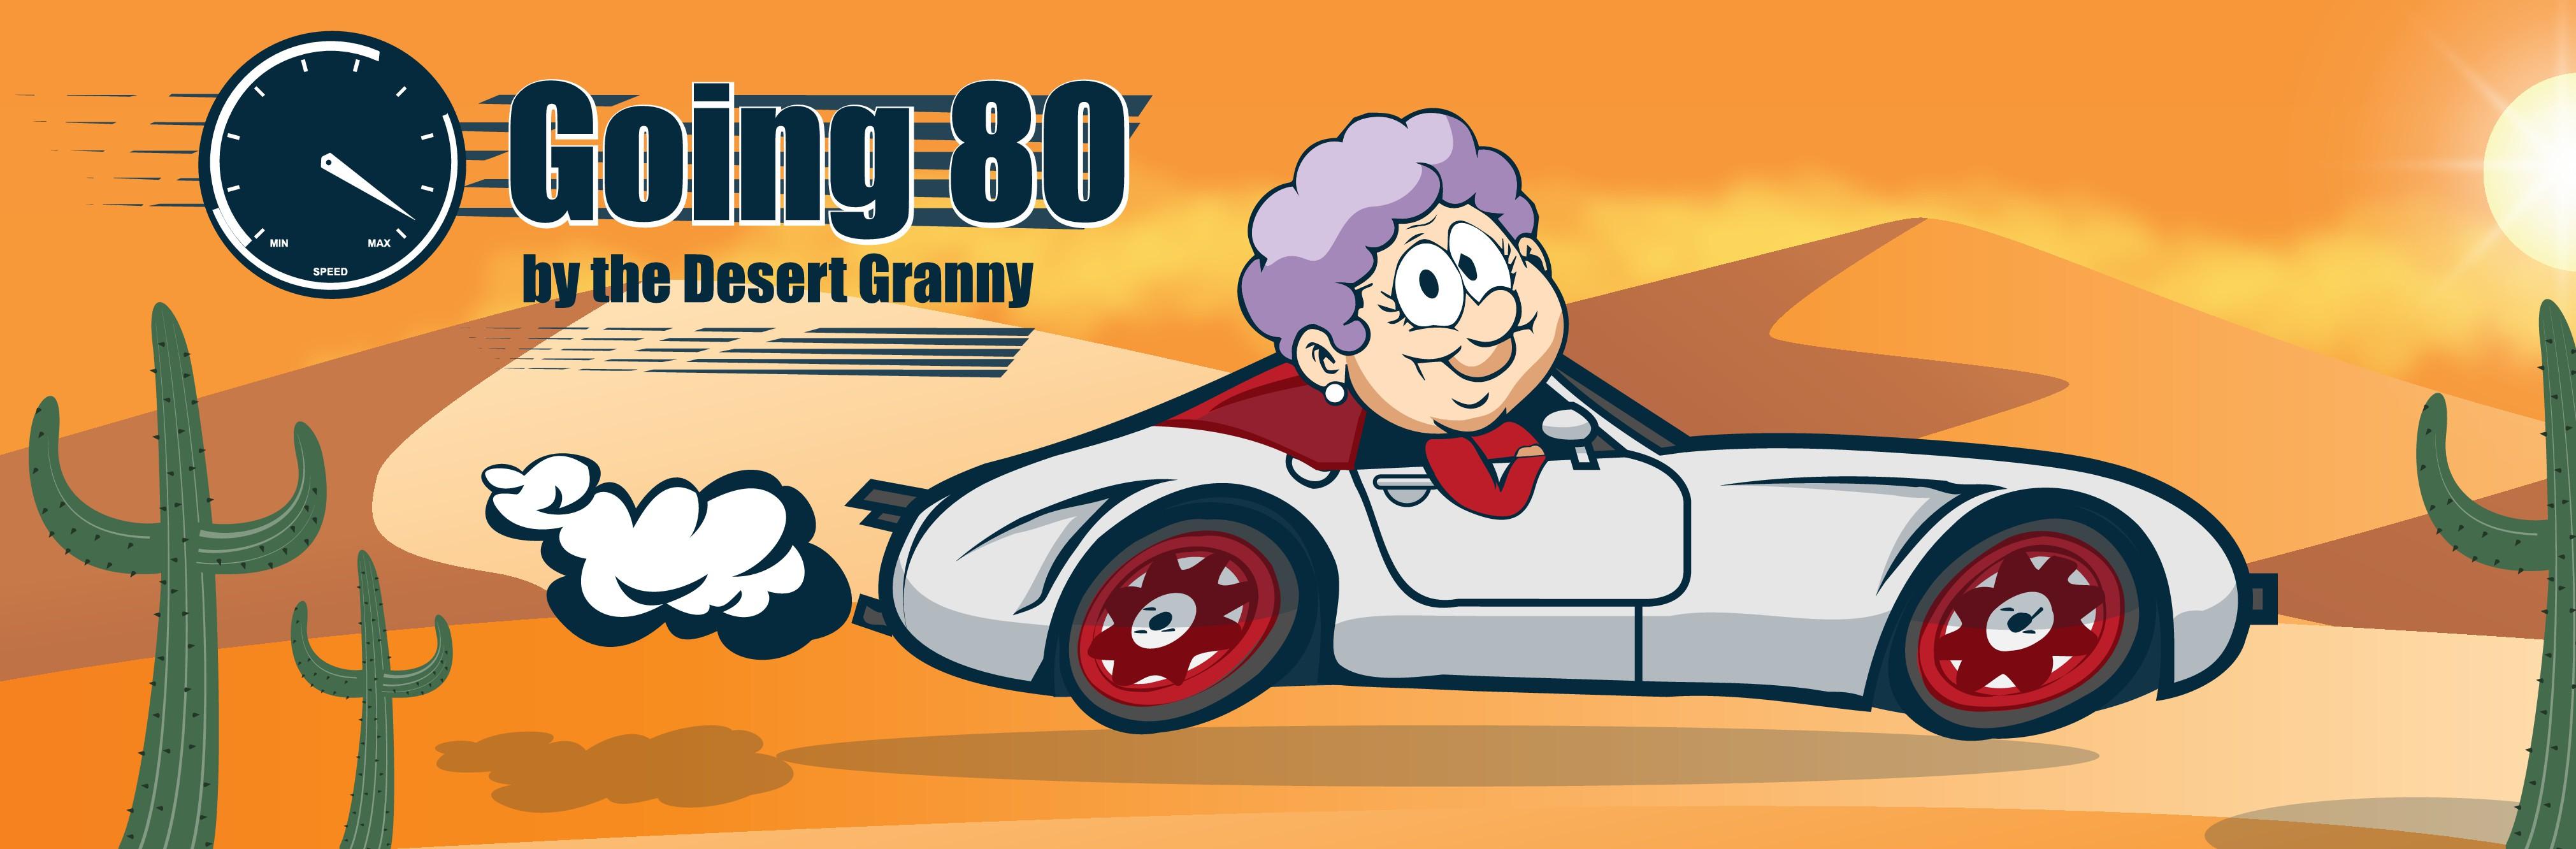 Create a banner for my Grandma's blog